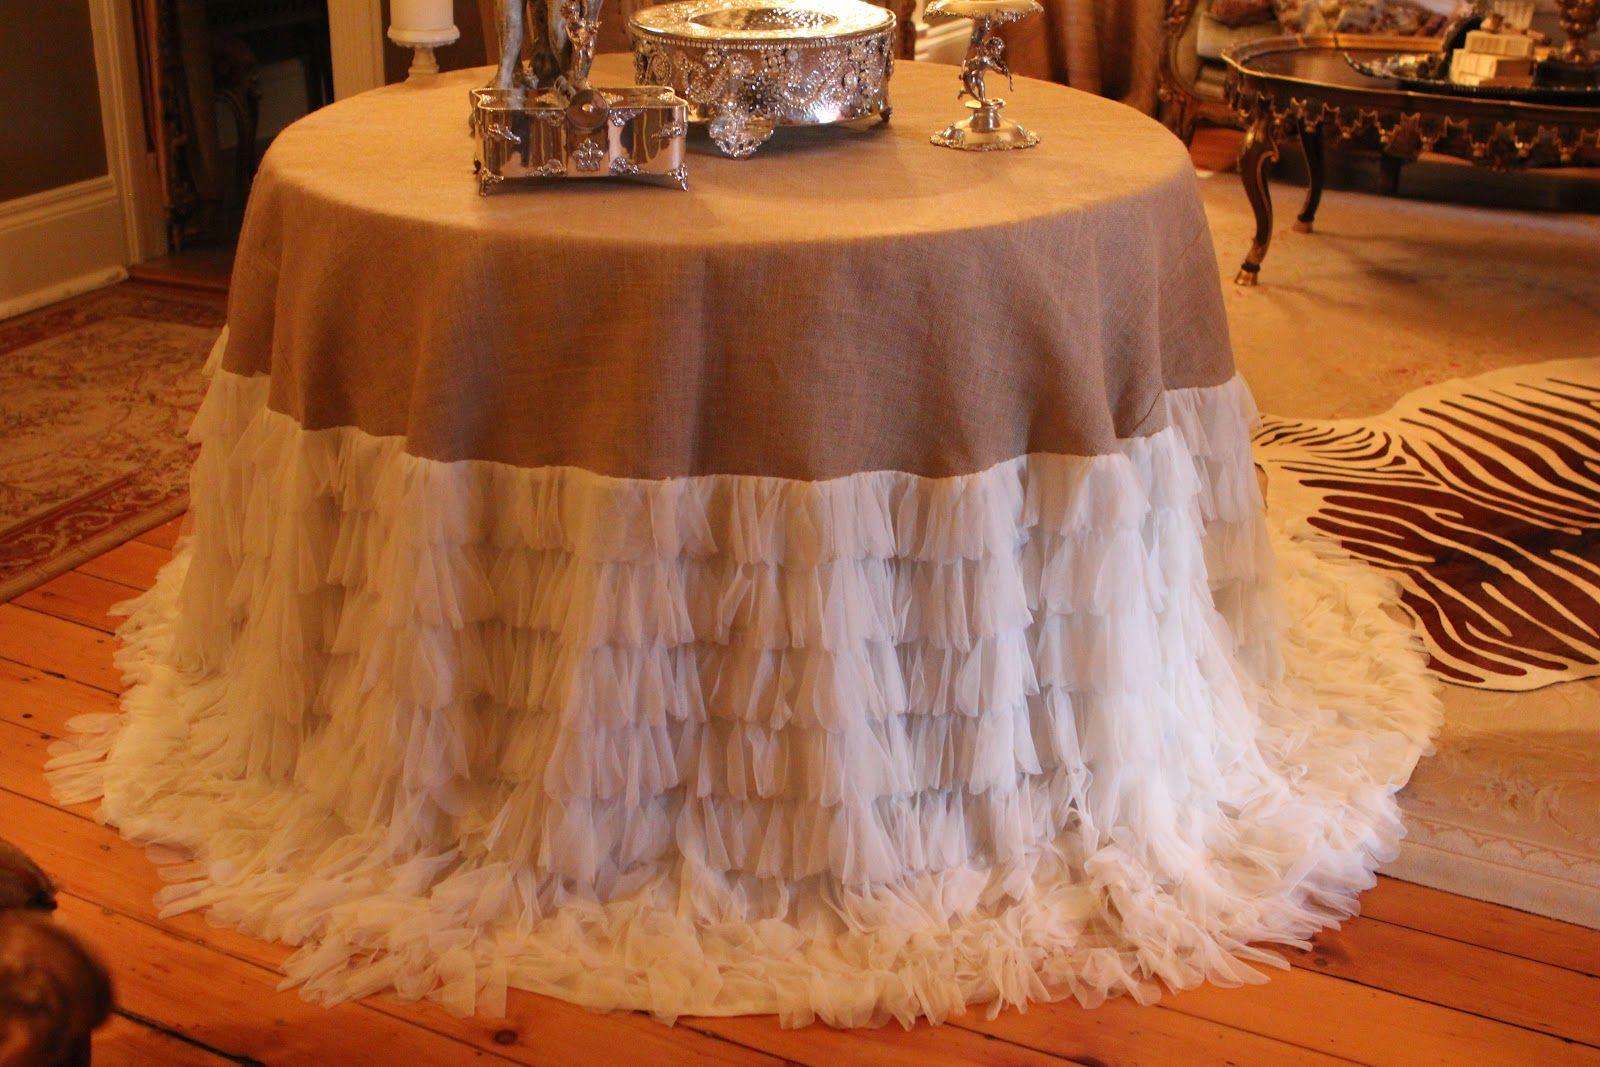 burlap-wedding-round-tables-fejimr0q.jpg (1600×1067) (With images ...